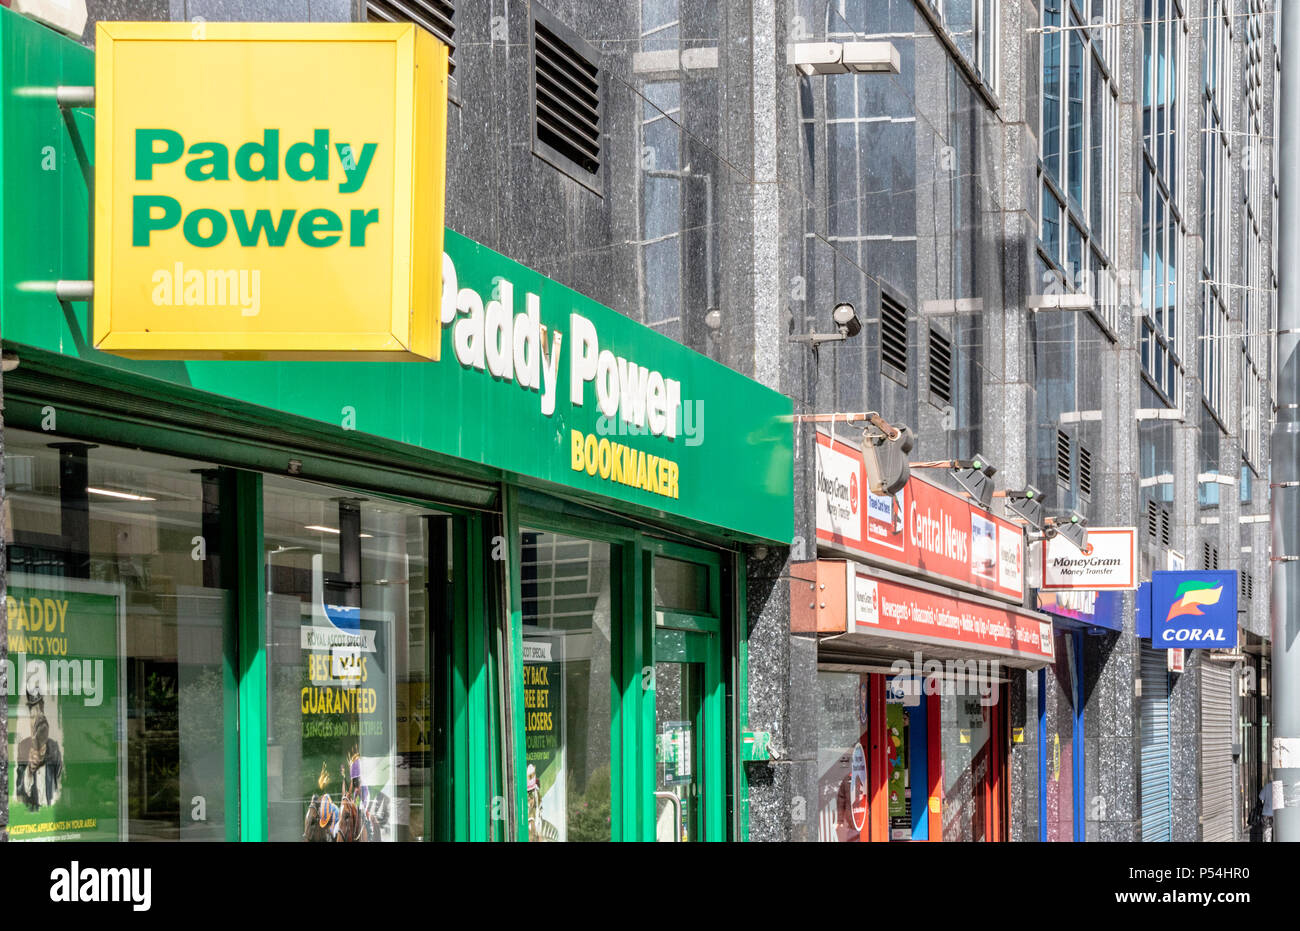 Paddy power uk betting shops germany royal baby name betting ladbrokes football